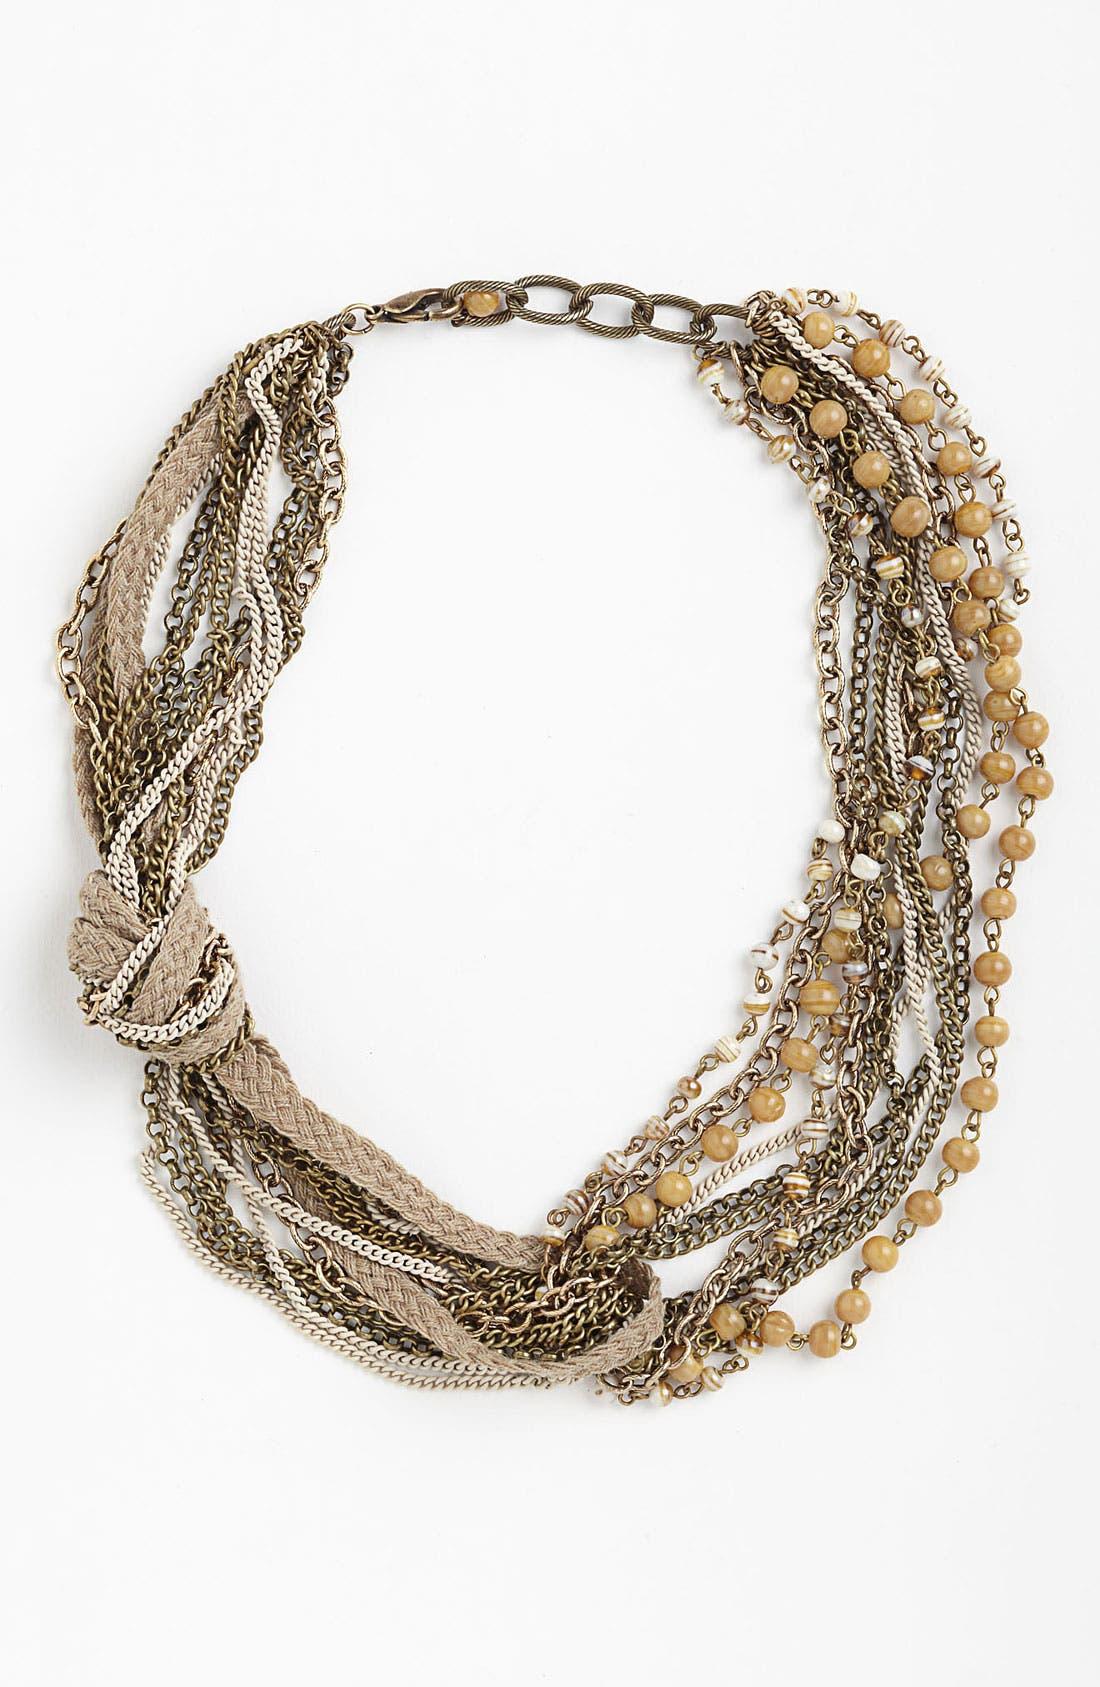 Alternate Image 1 Selected - Bonnie Jonas Multistrand Necklace